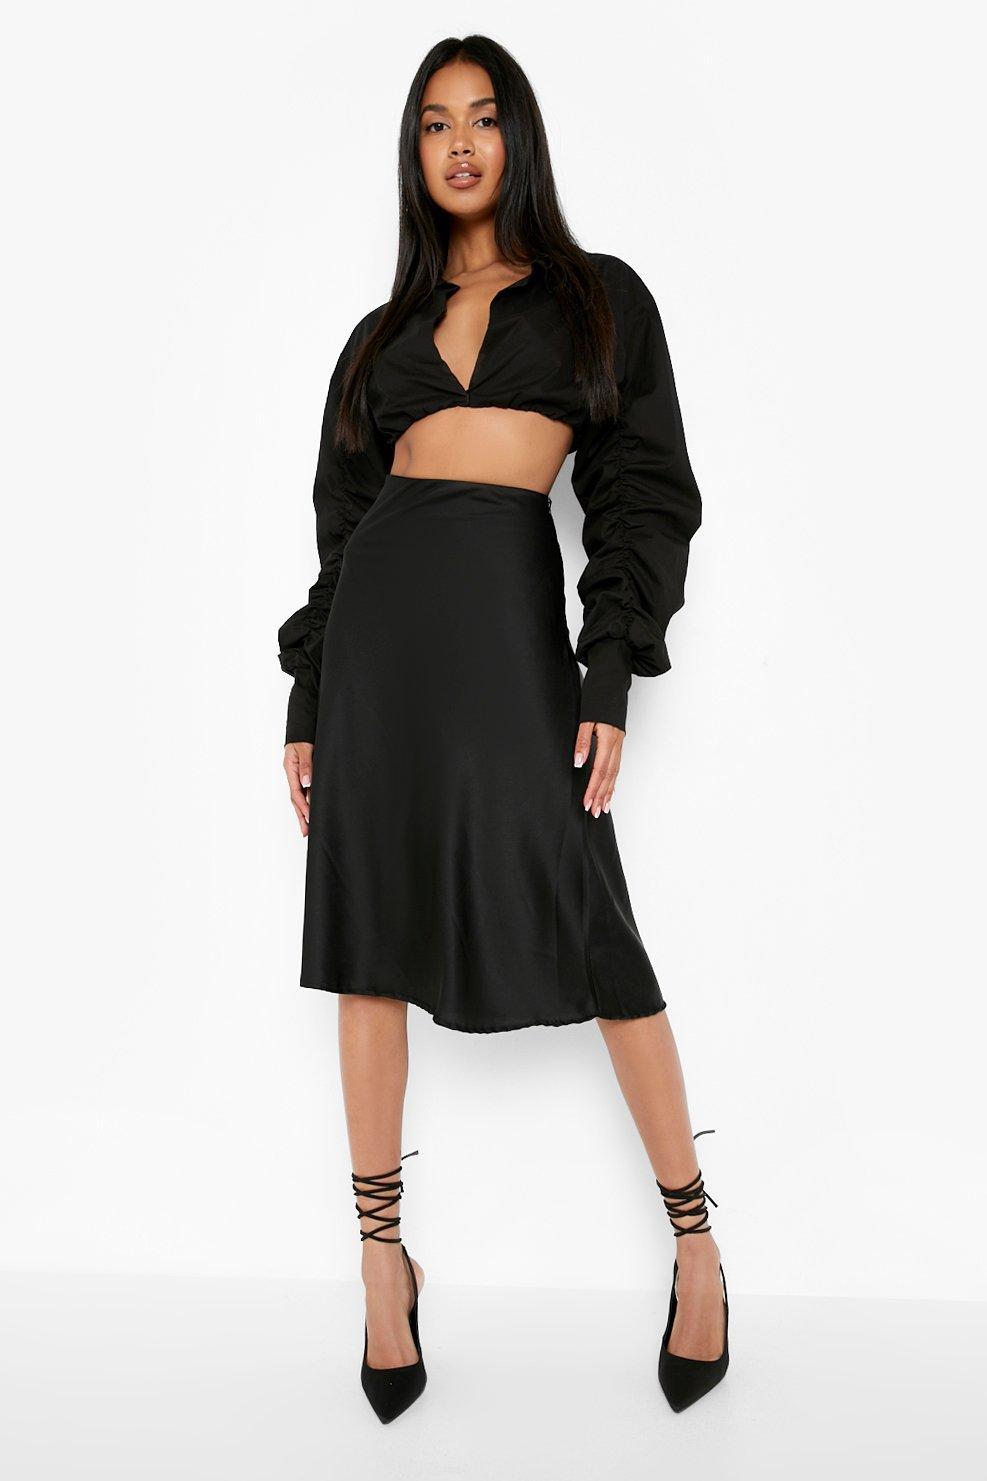 1930s Style Skirts : Midi Skirts, Tea Length, Pleated Womens Satin Bias Cut Slip Midi Skirt - Black - 12 $14.40 AT vintagedancer.com